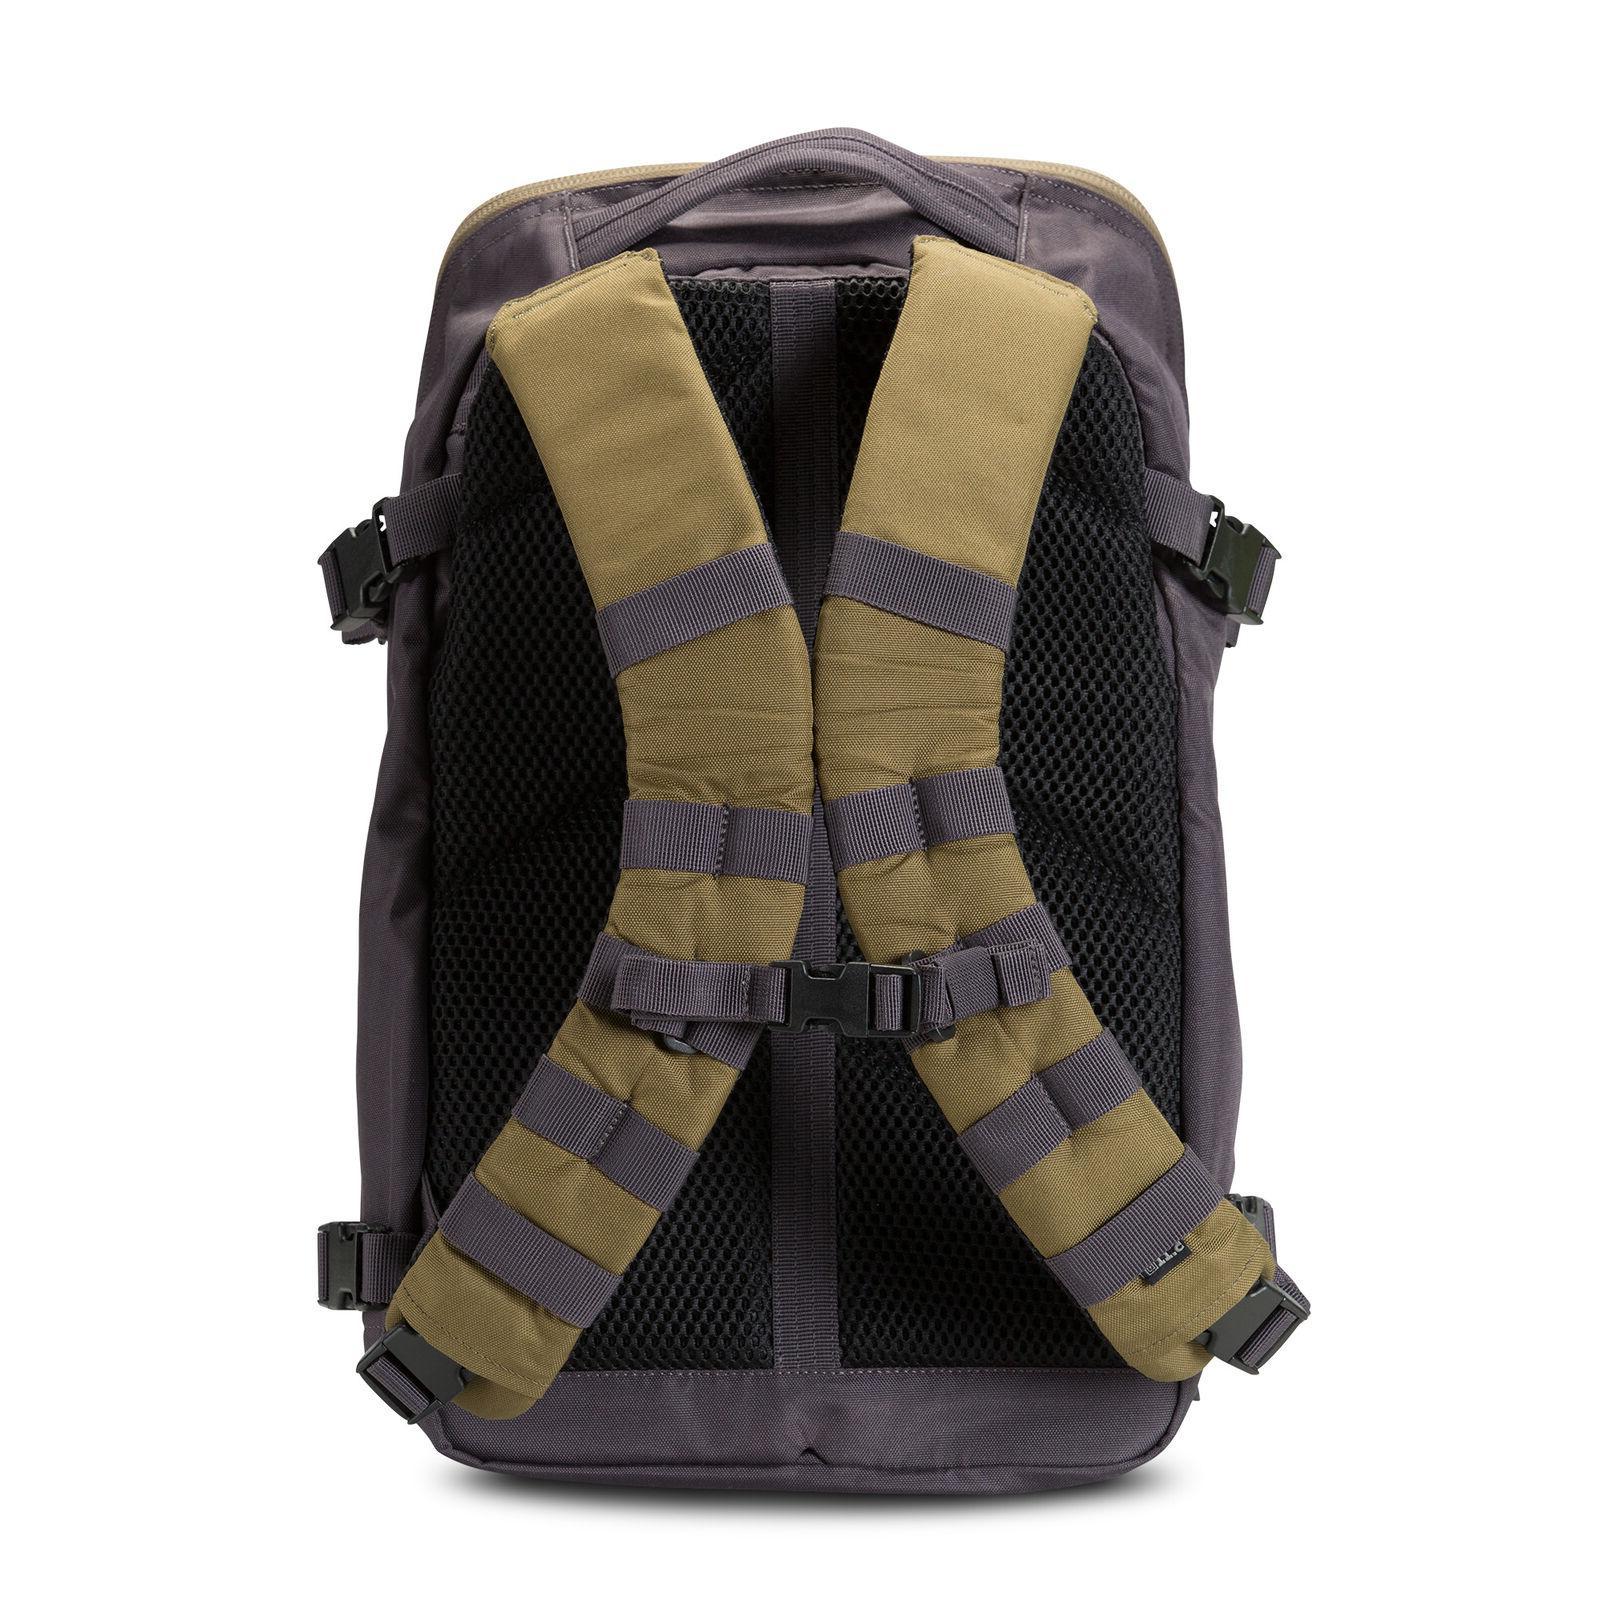 5.11 Fast Zipper Tactical Backpack Outdoor Travel Bag